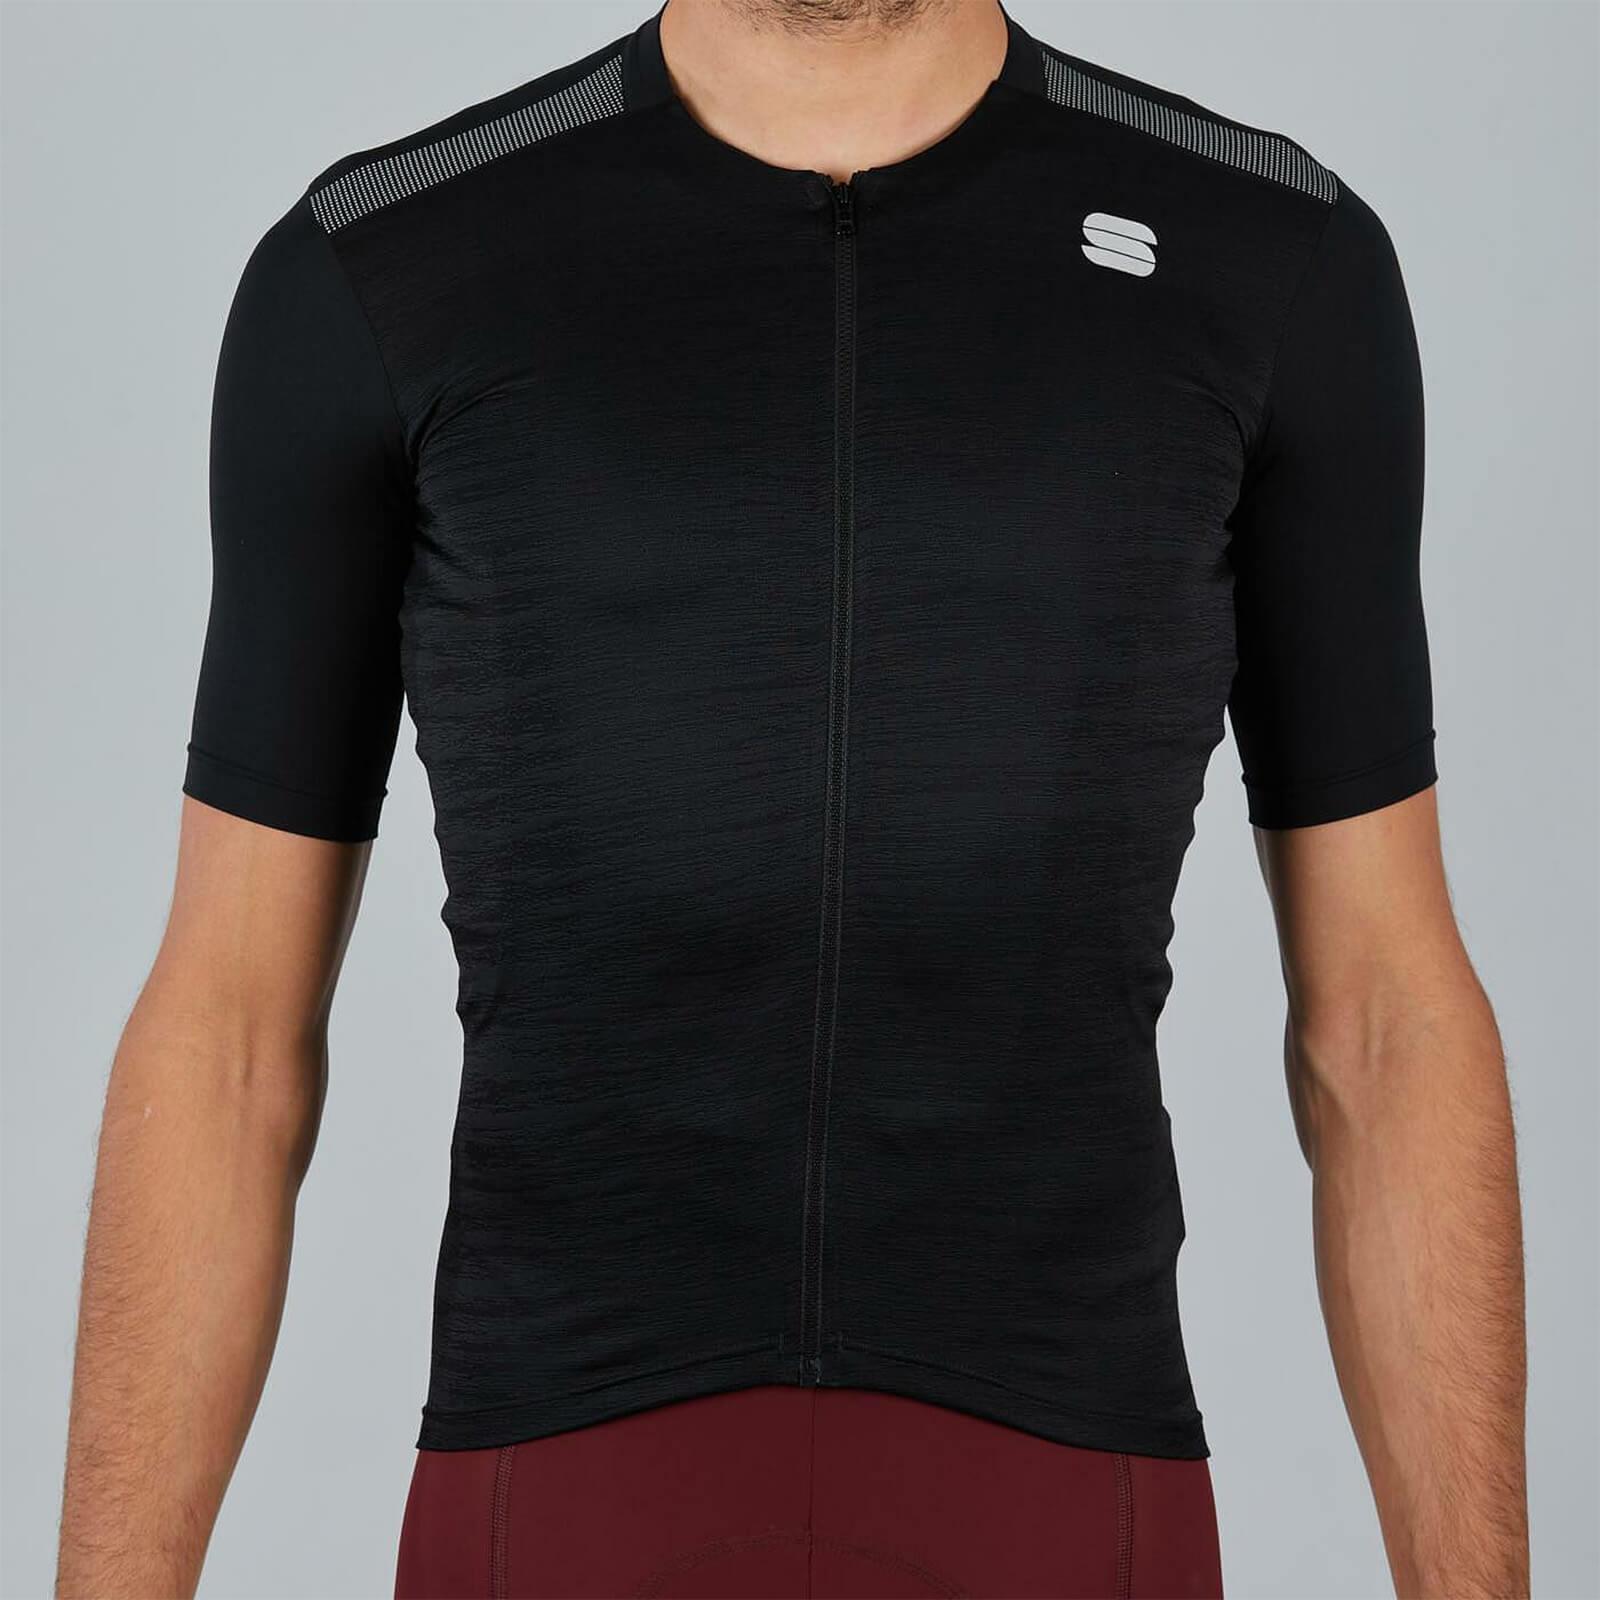 Sportful Supergiara Jersey - XL - Black